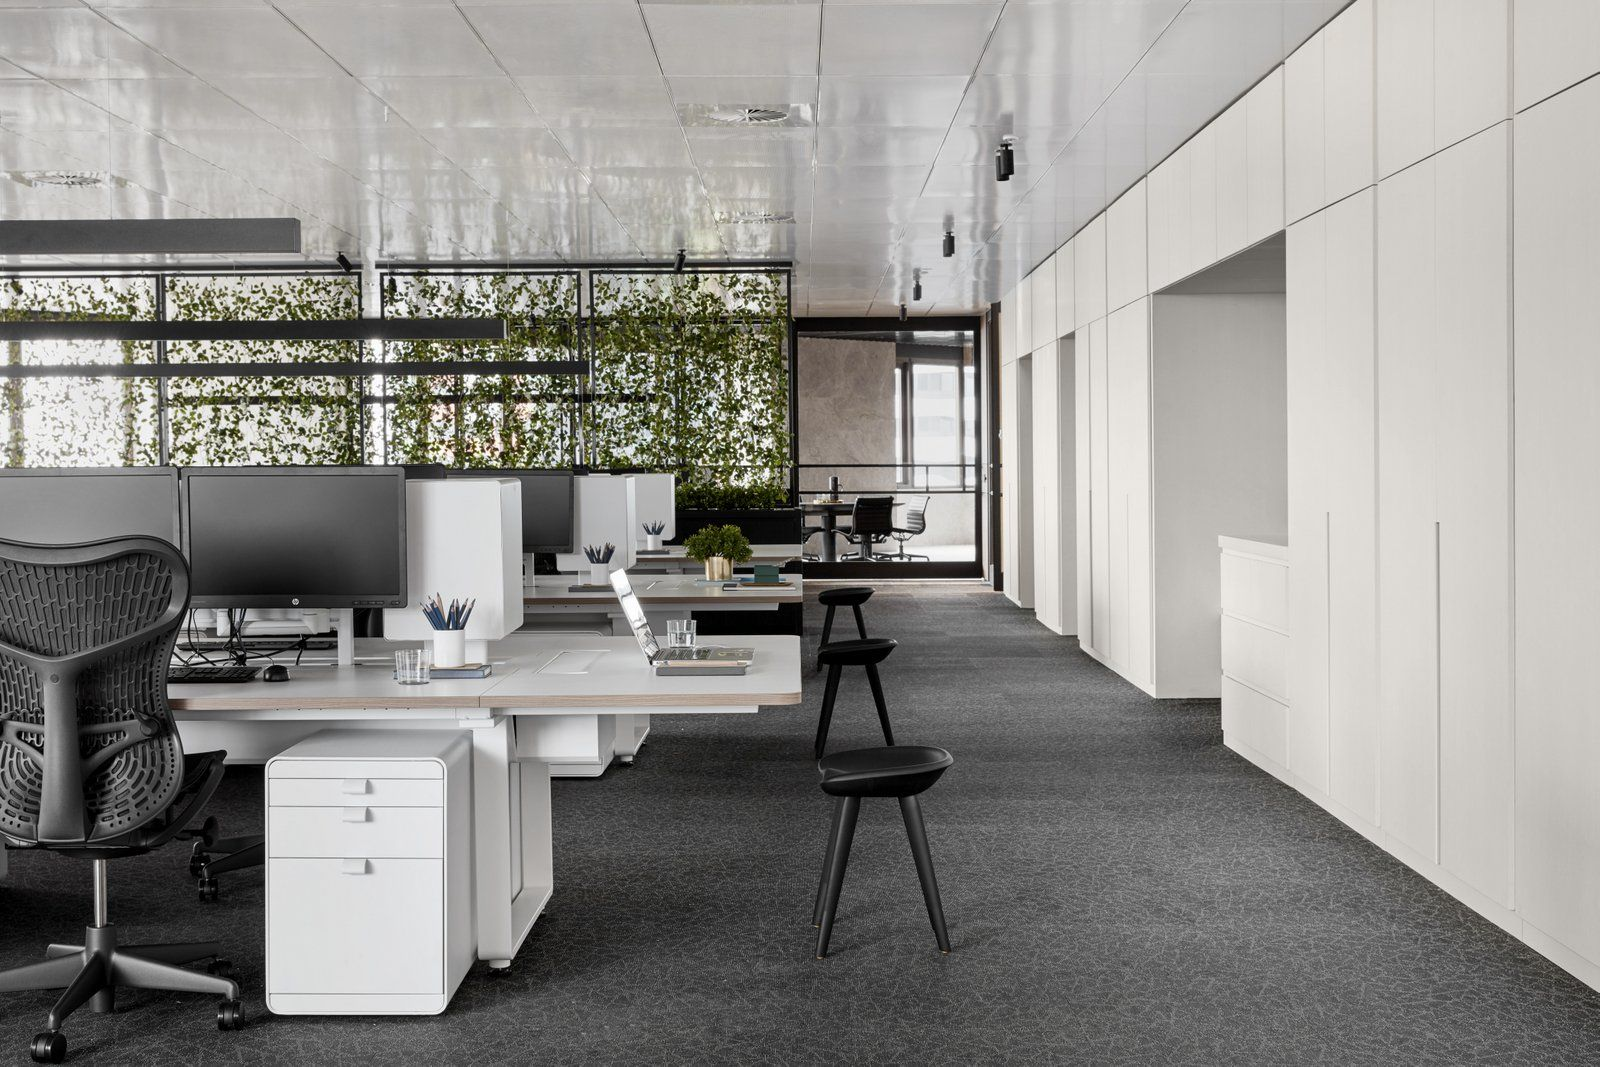 law office interiors. Interiors Law Office E